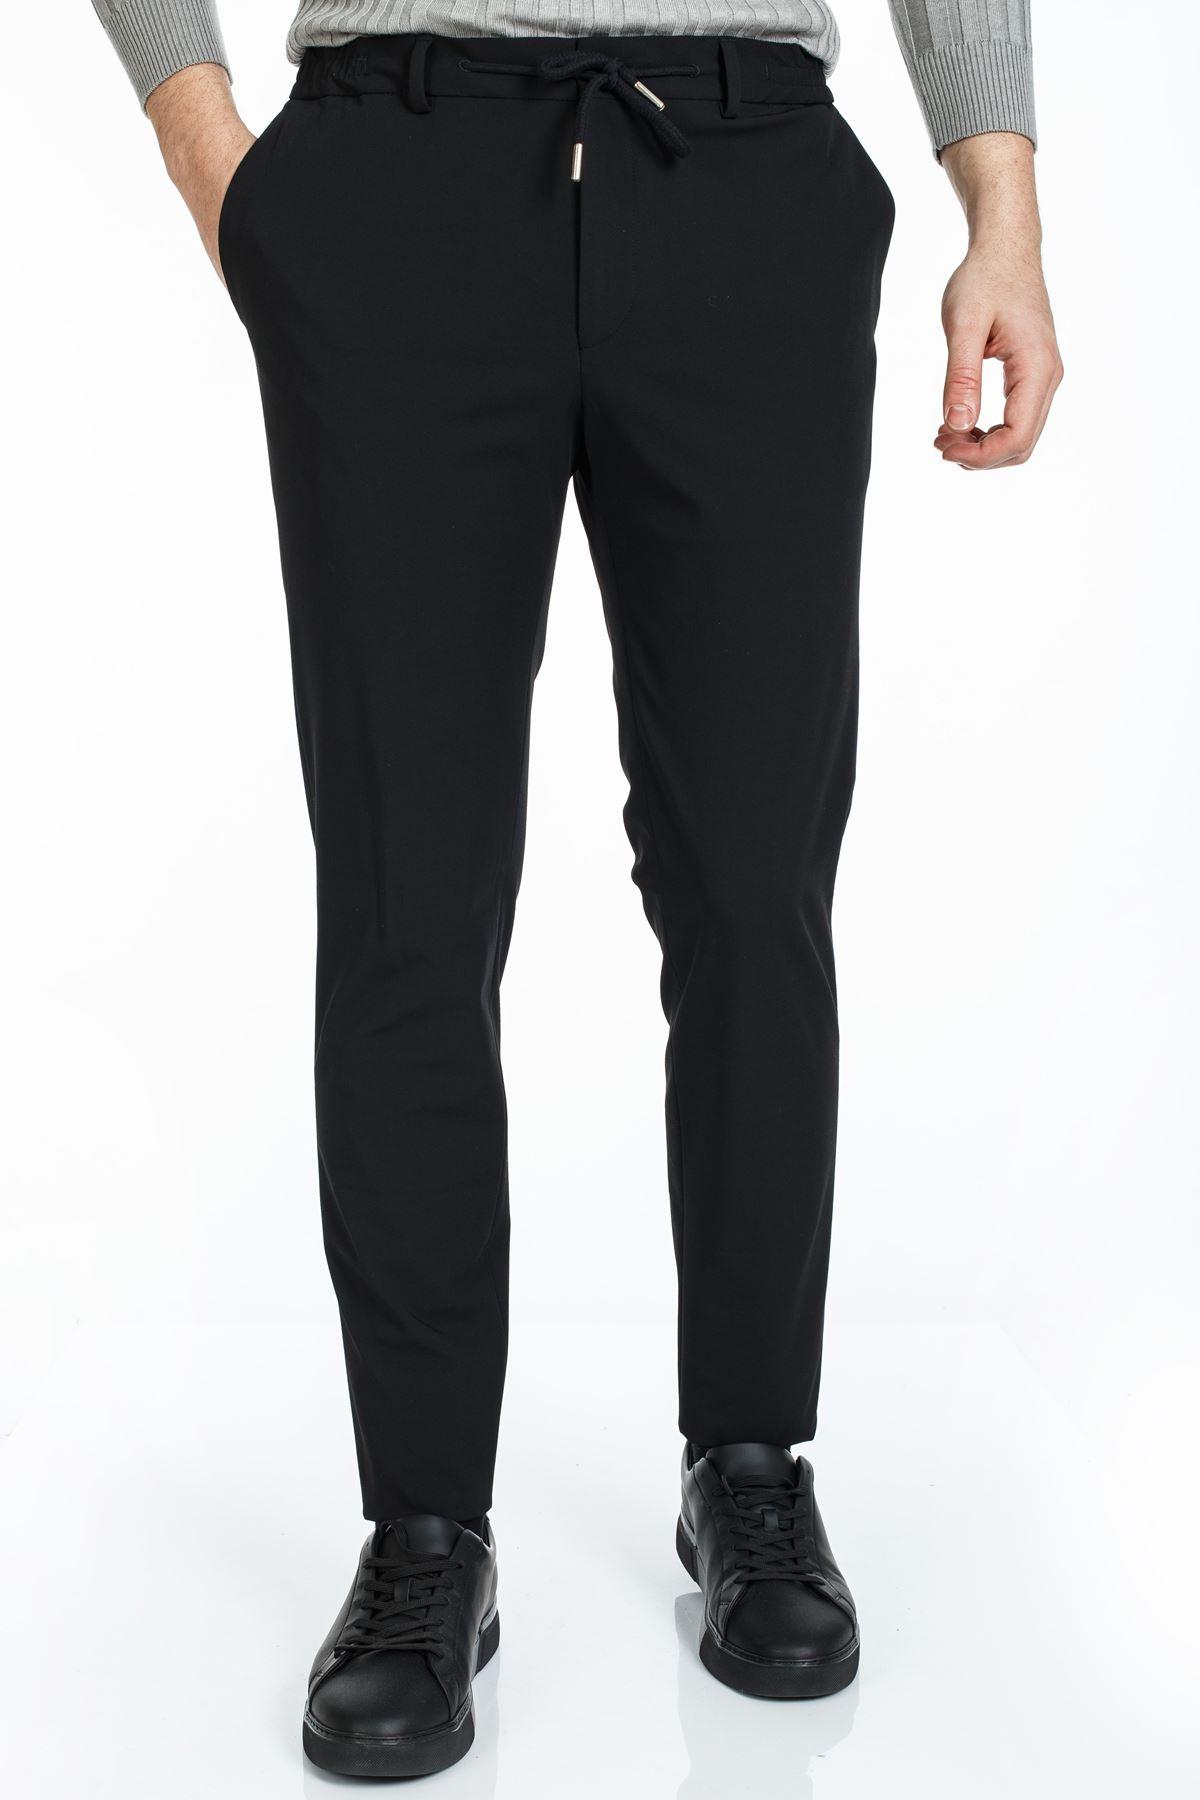 Siyah Likralı Süper Slim Kalıp Jogger Pantolon